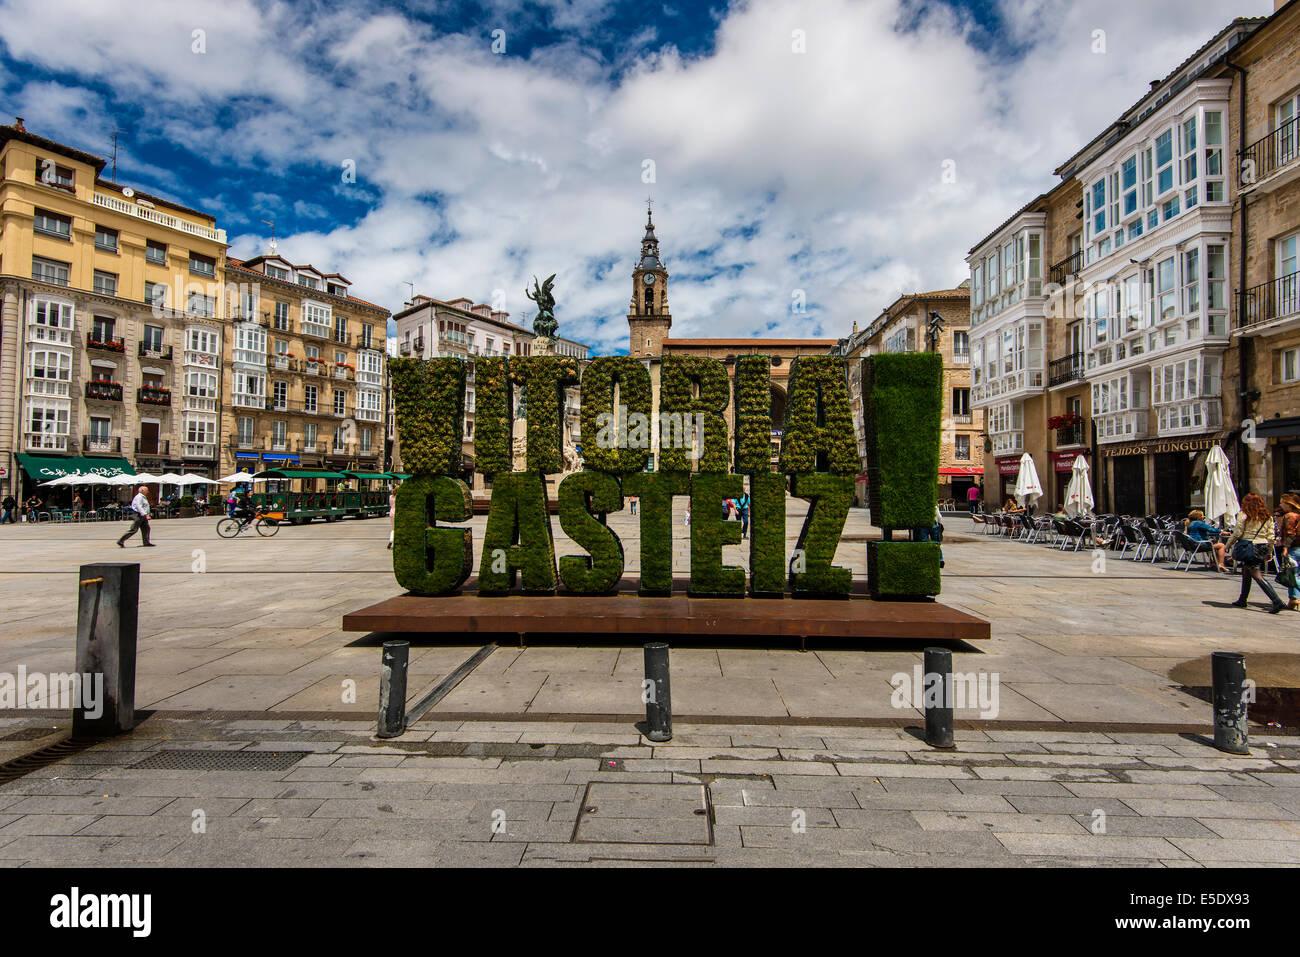 Plaza de la Virgen Blanca, Vitoria-Gasteiz, Alava, Basque Country, Spain - Stock Image